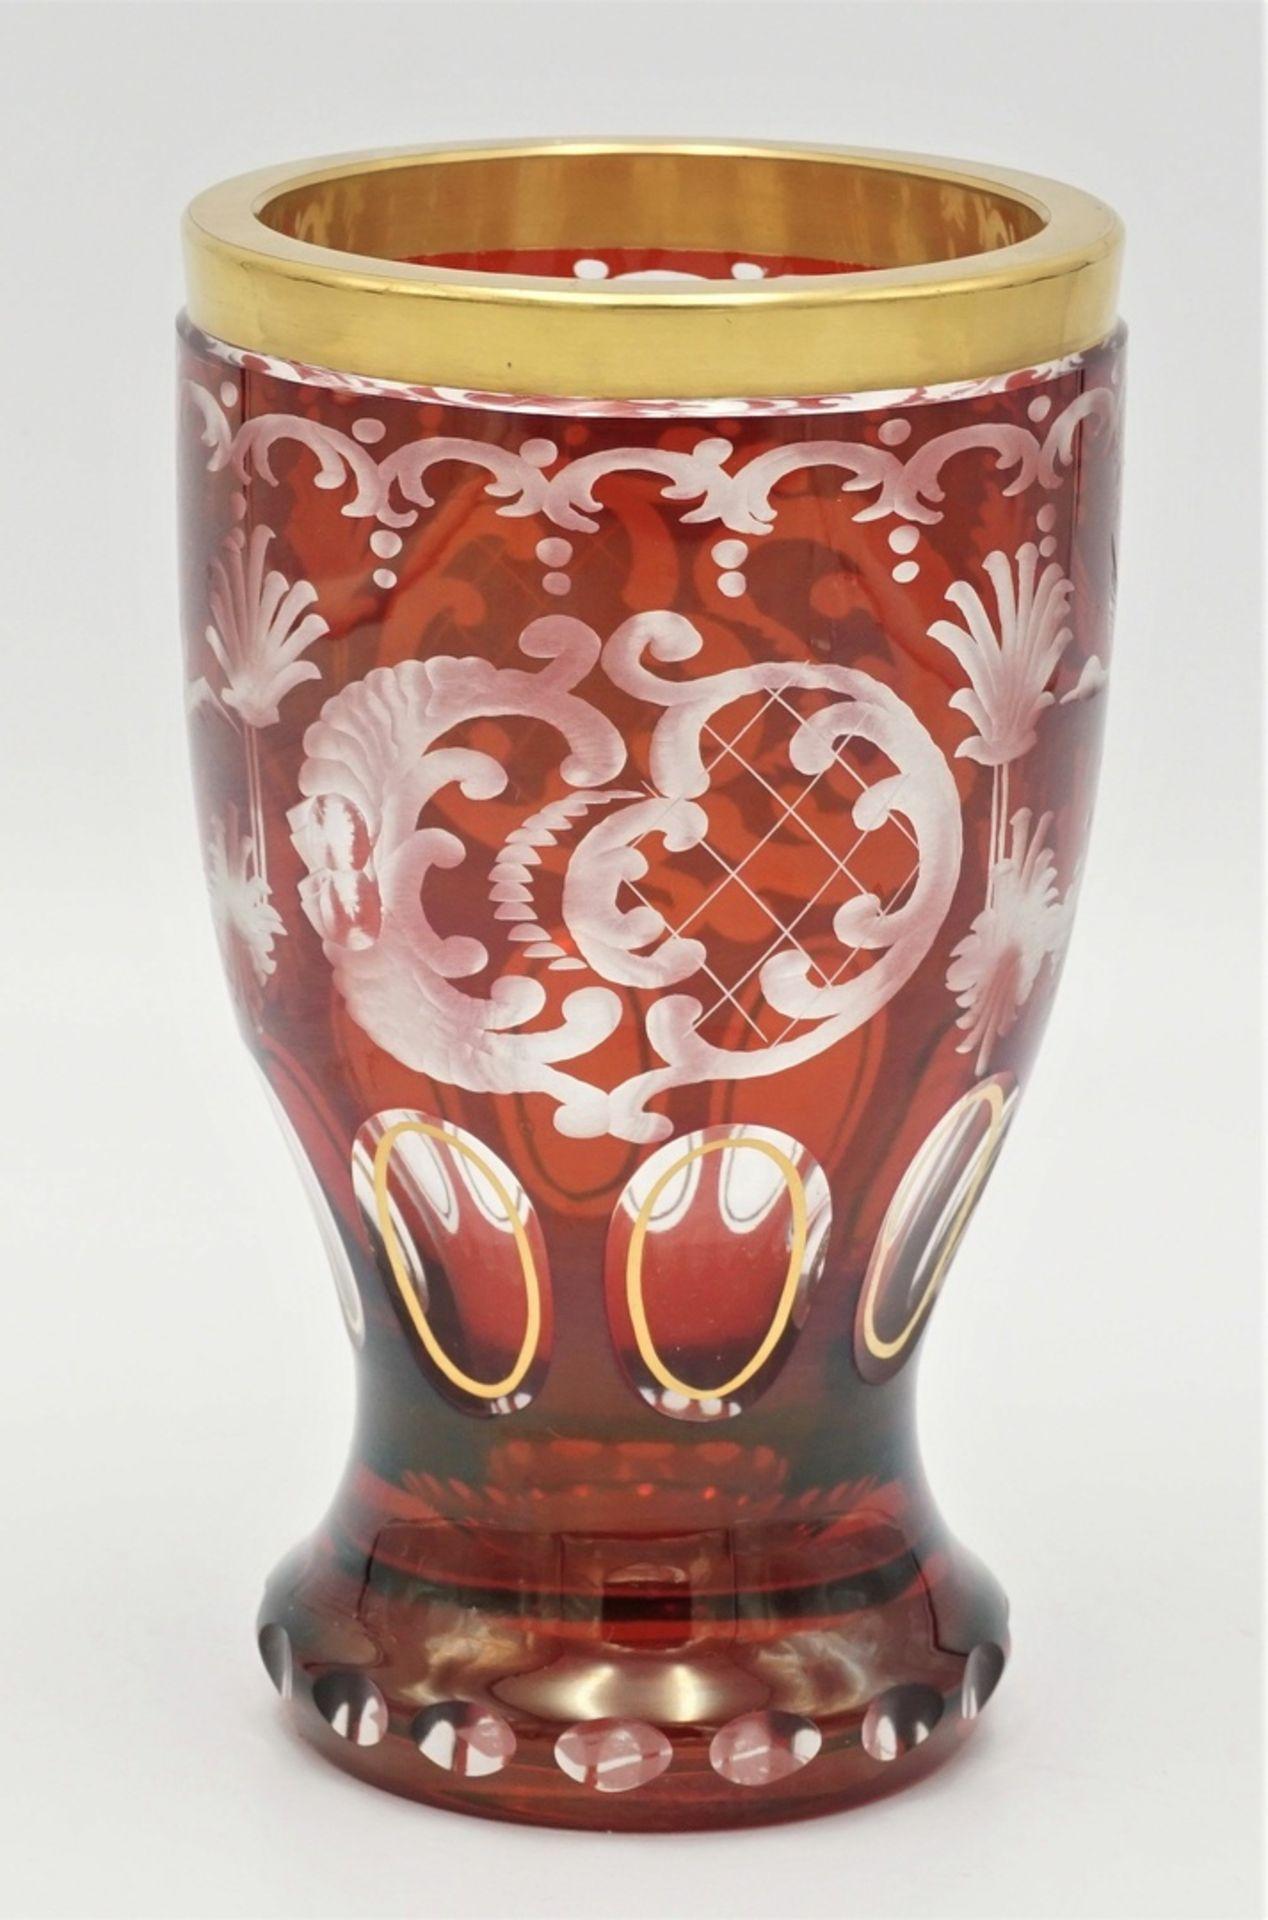 Böhmen Becherglas - Bild 3 aus 3